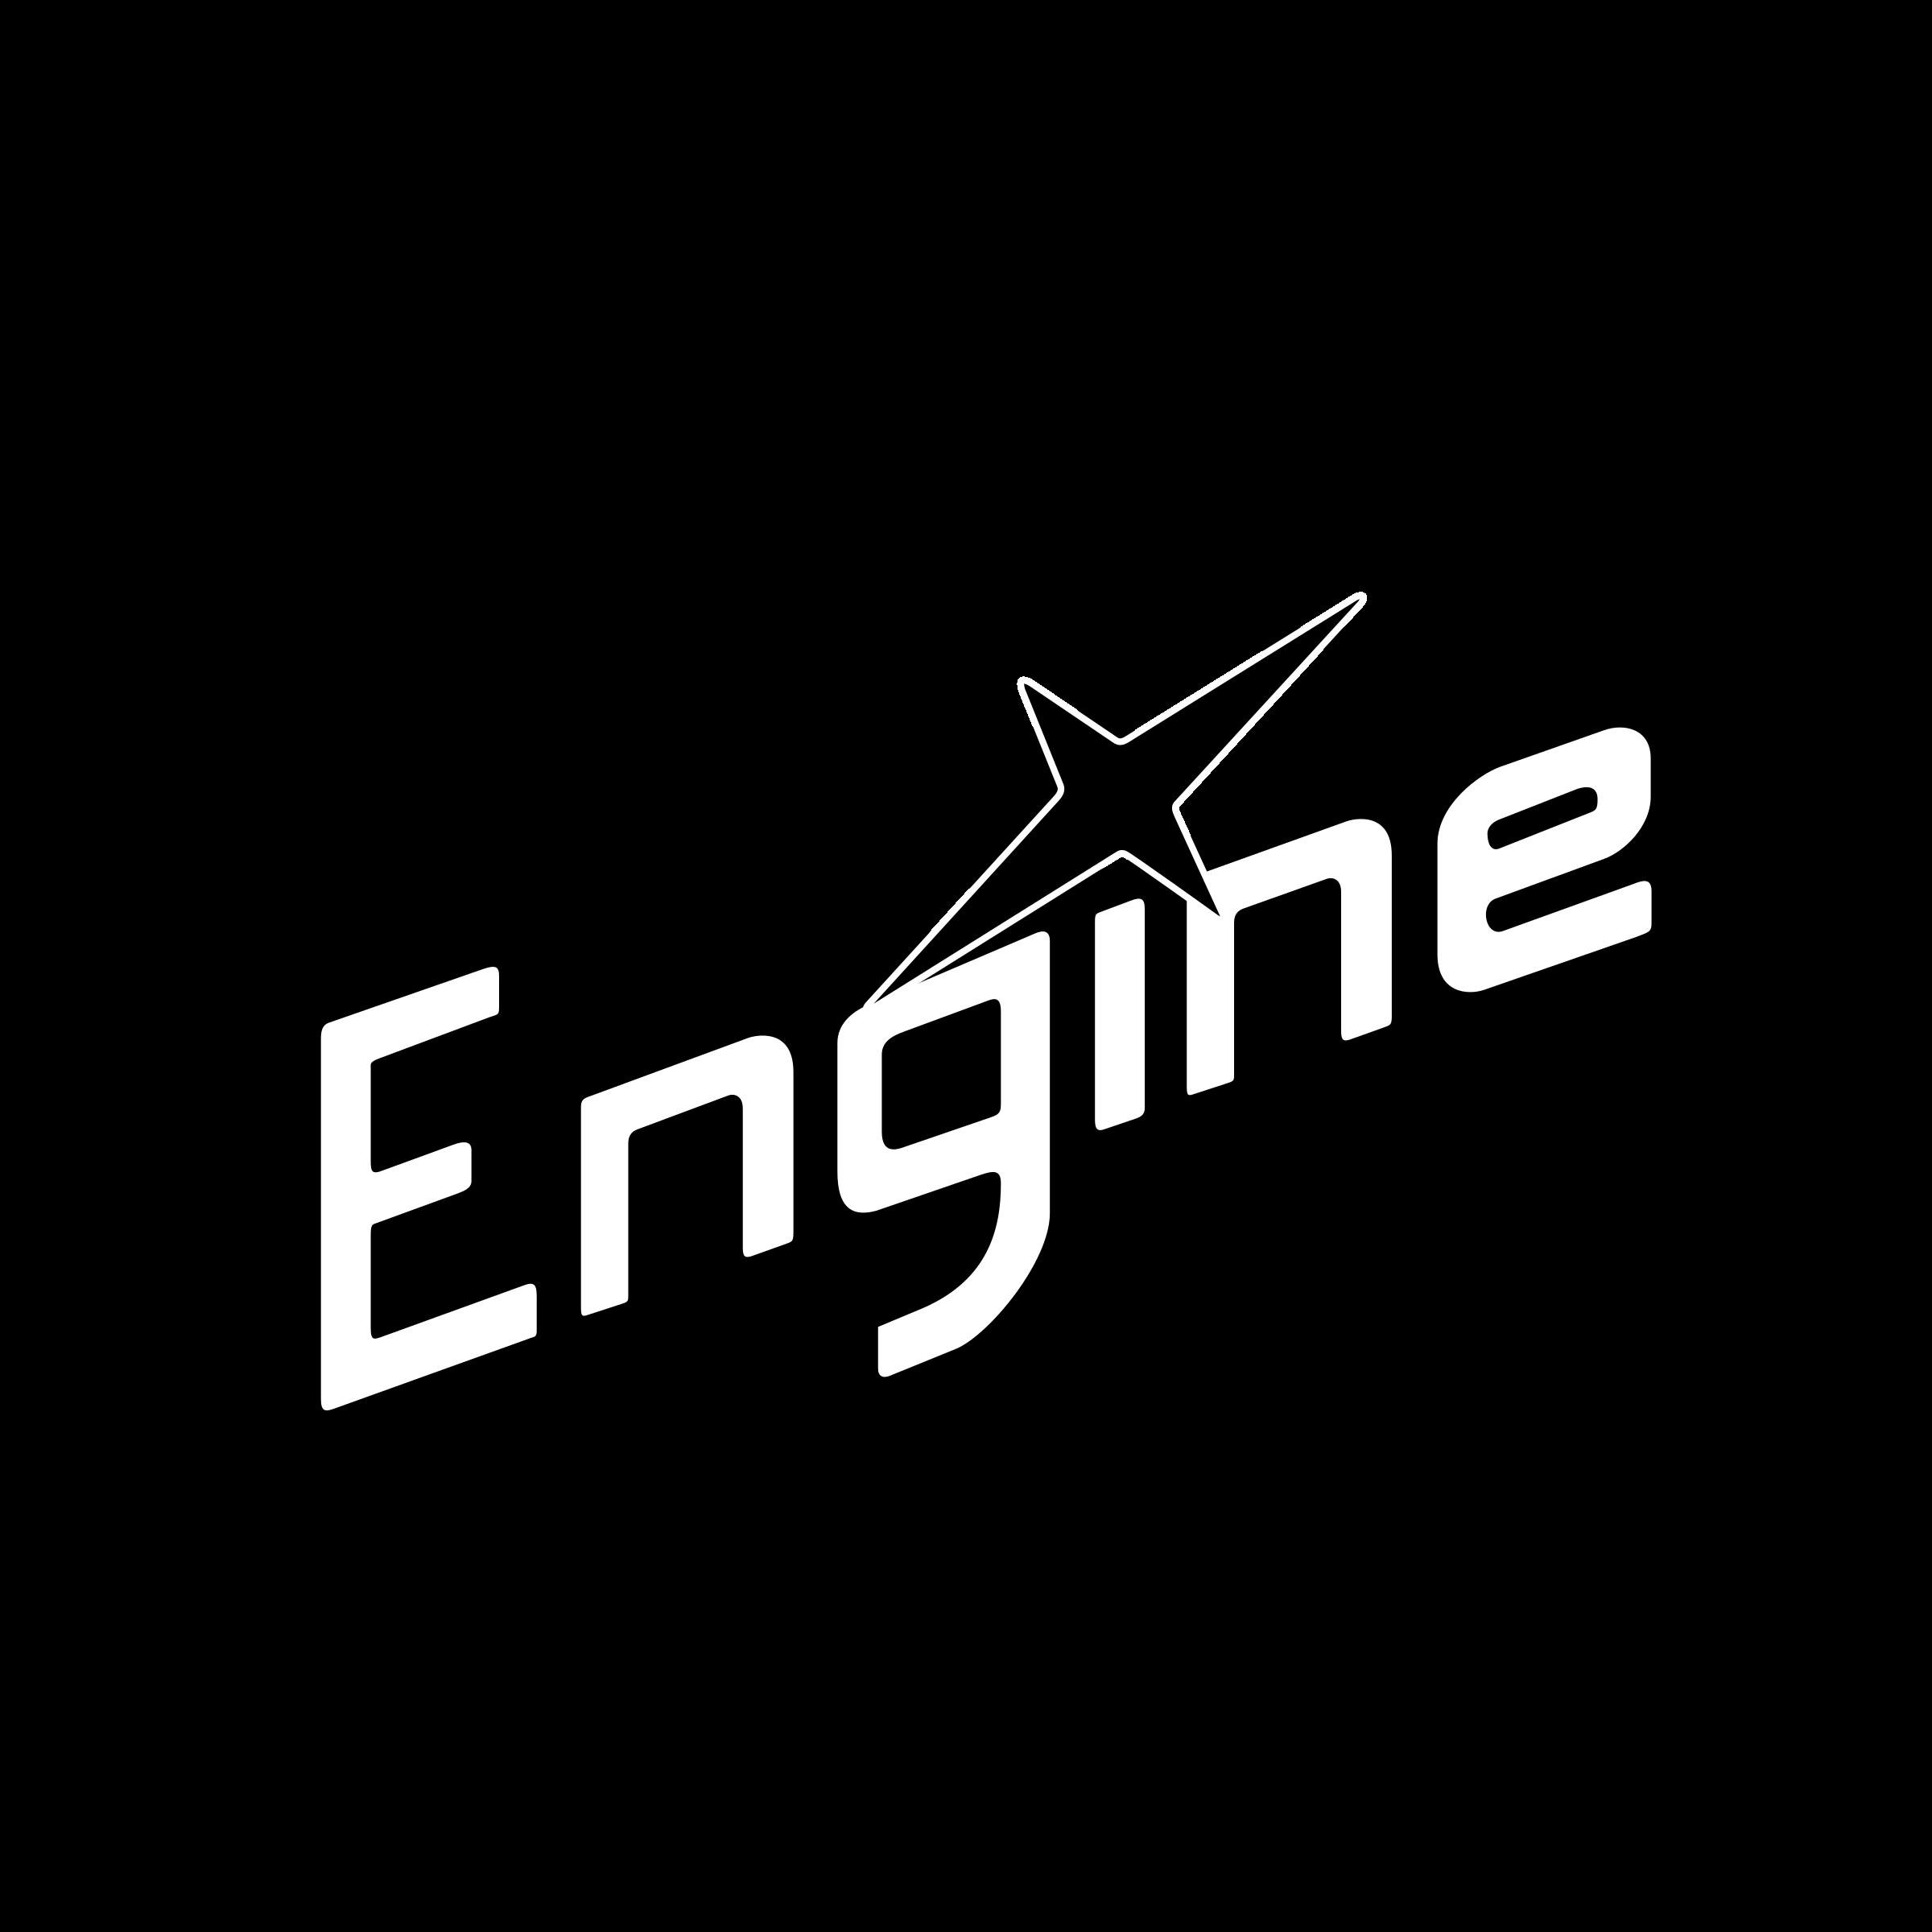 Pc engine logo — 2